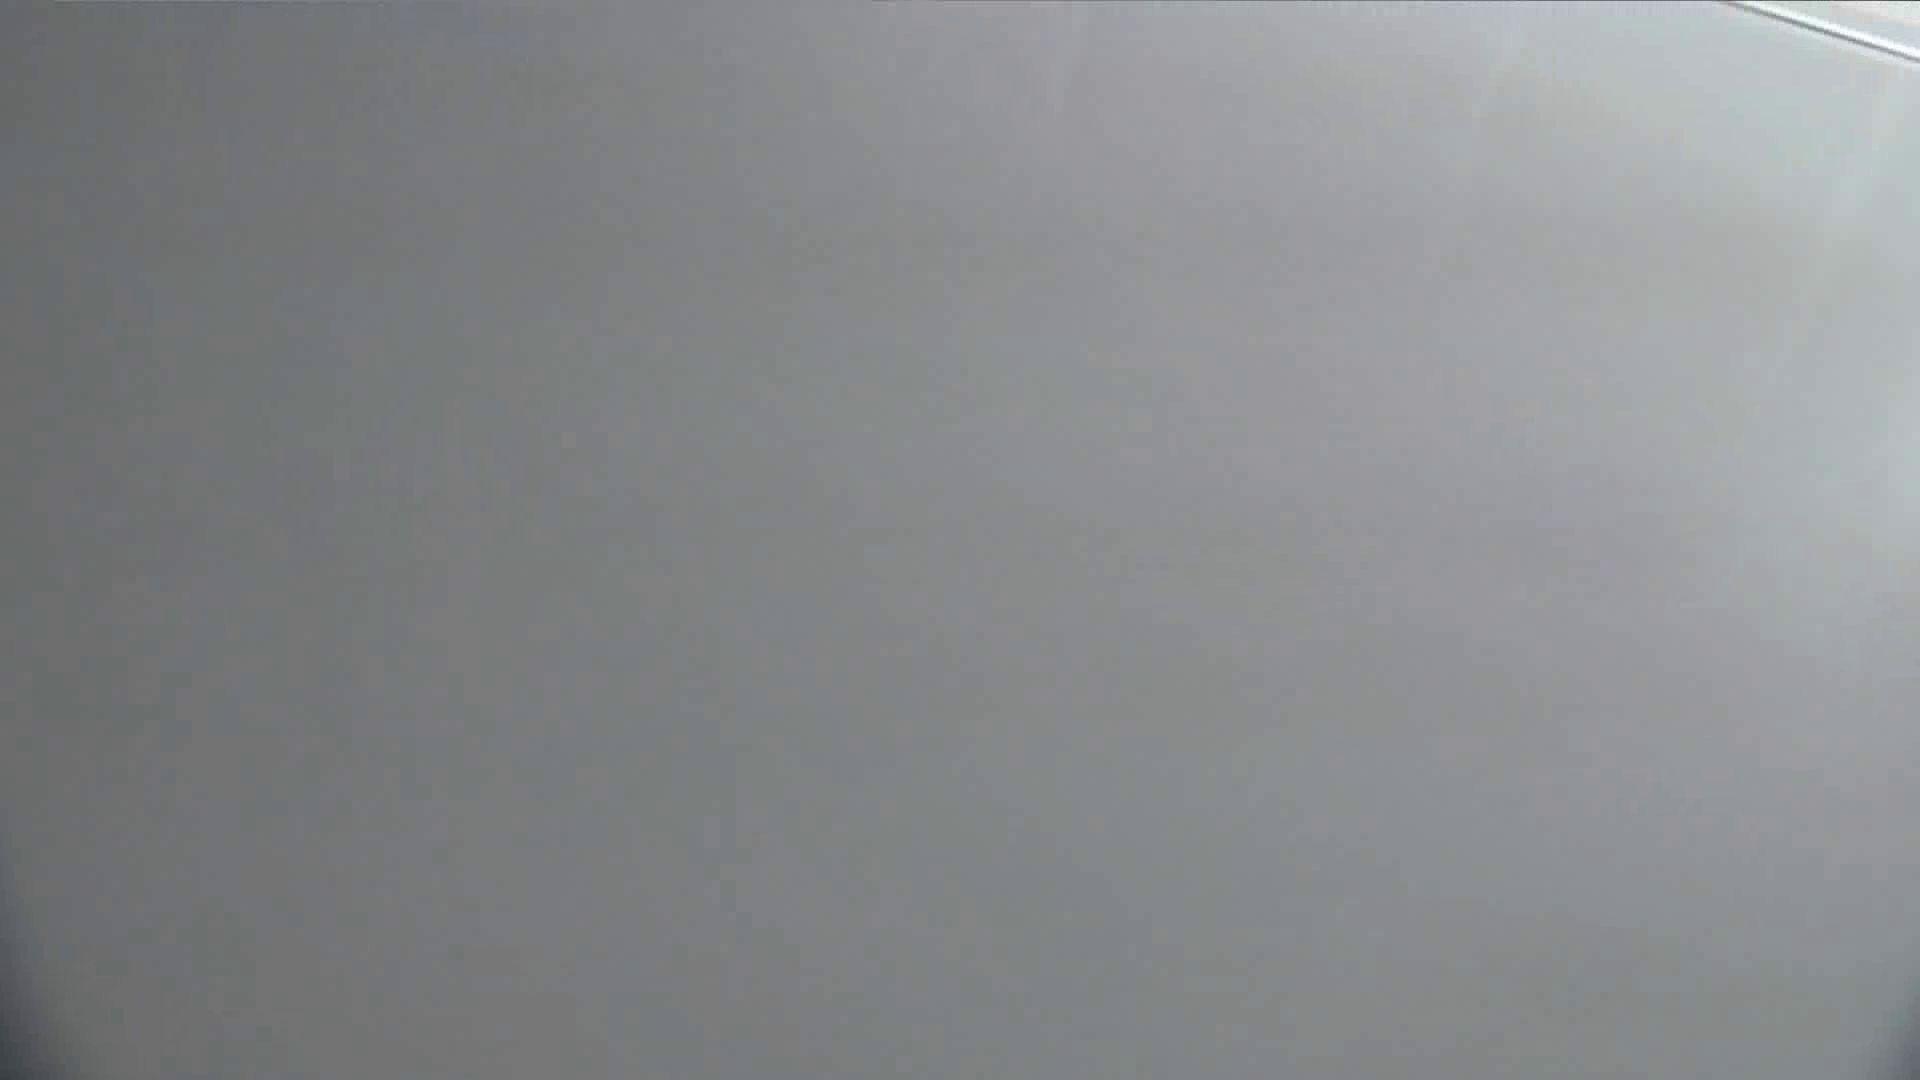 vol.27 命がけ潜伏洗面所! 小嶋陽菜似のピンクオシャレさん 美人 アダルト動画キャプチャ 78pic 5